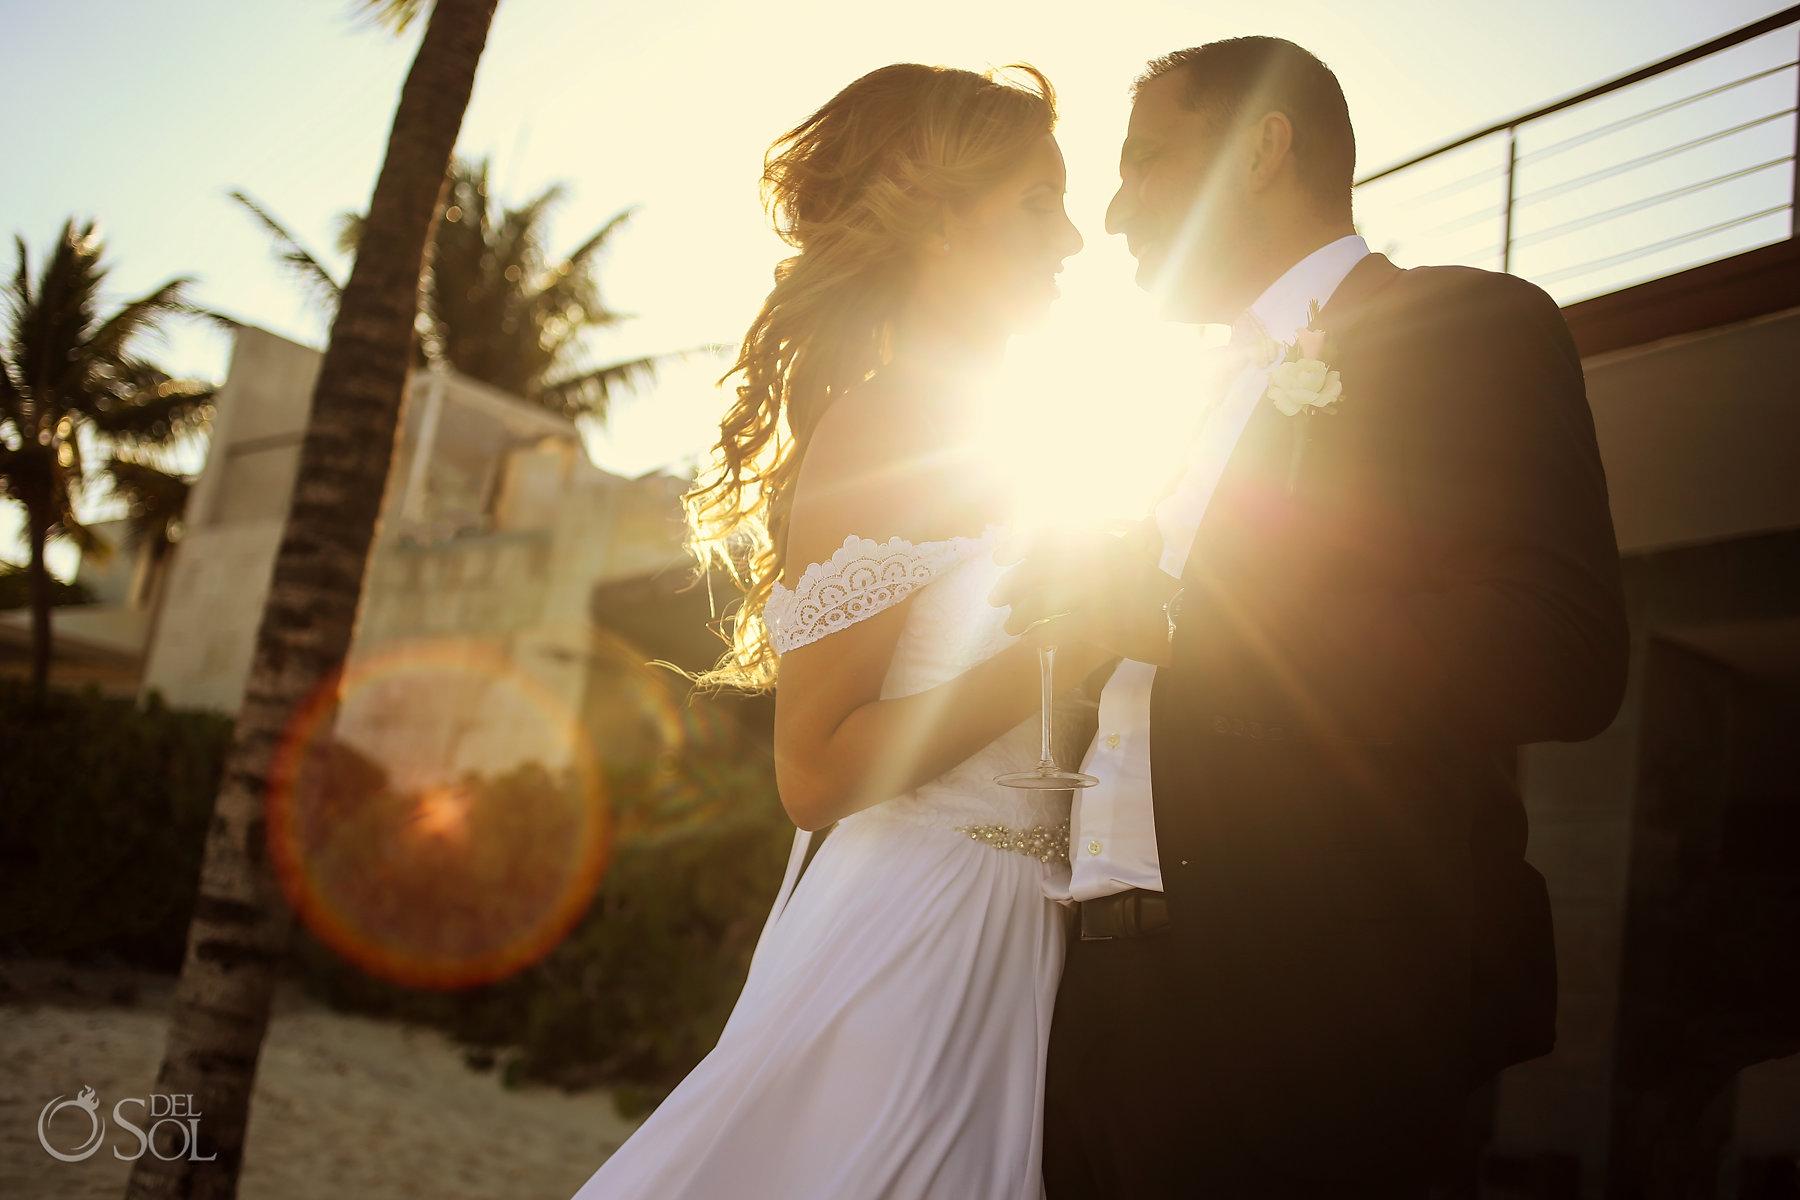 Sunset backlight romantic elopement photoshoot best elopement locations Mexico Blue Diamond Luxury Boutique Hotel